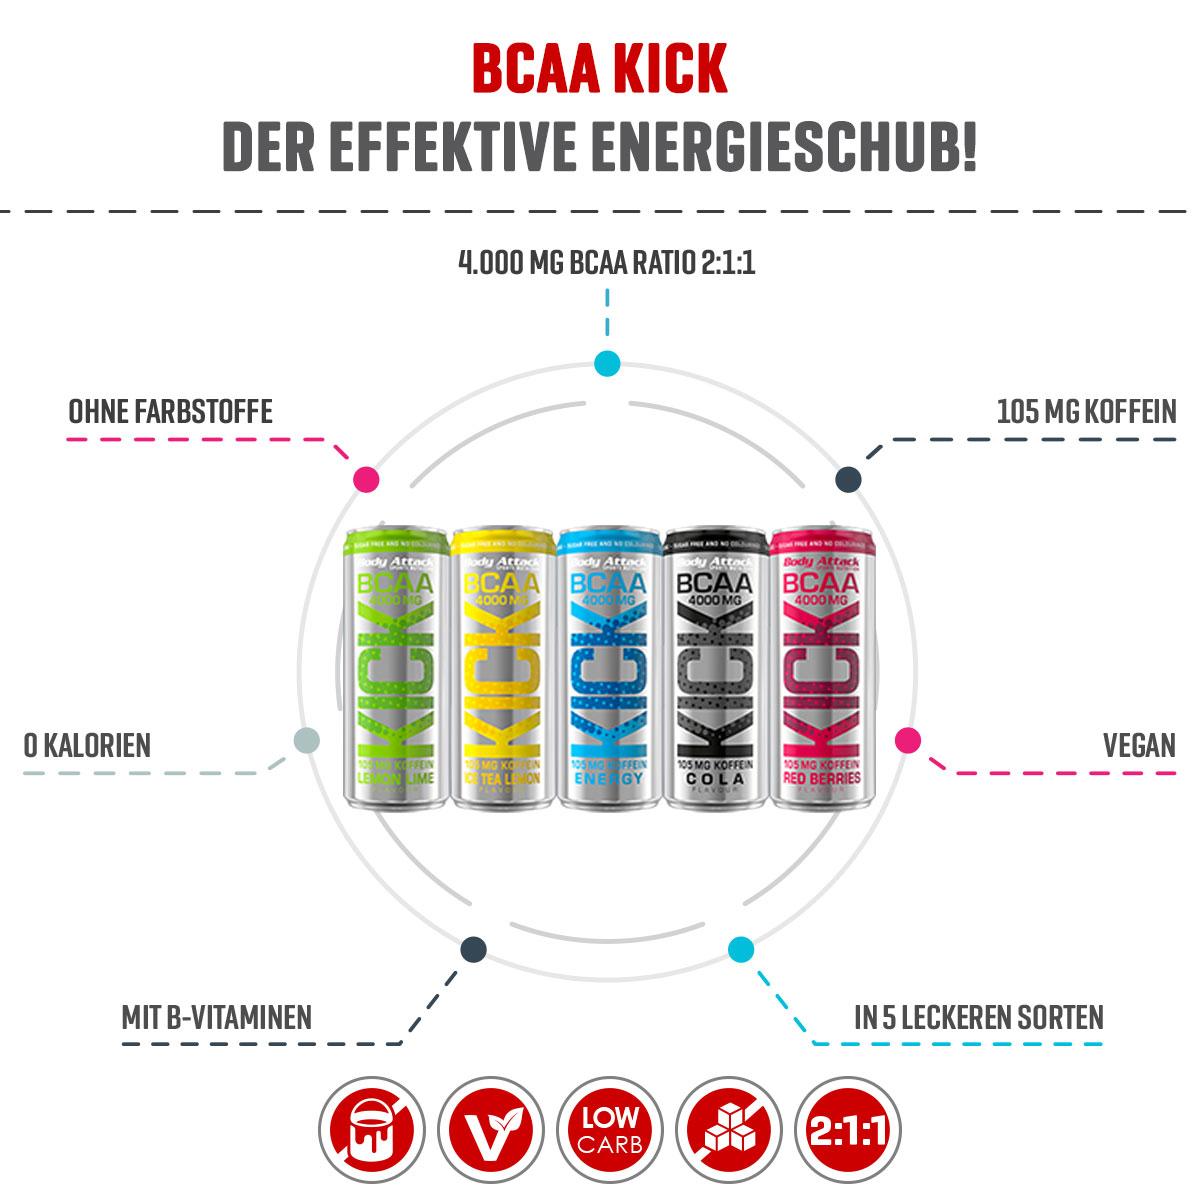 BCAA KICK Info